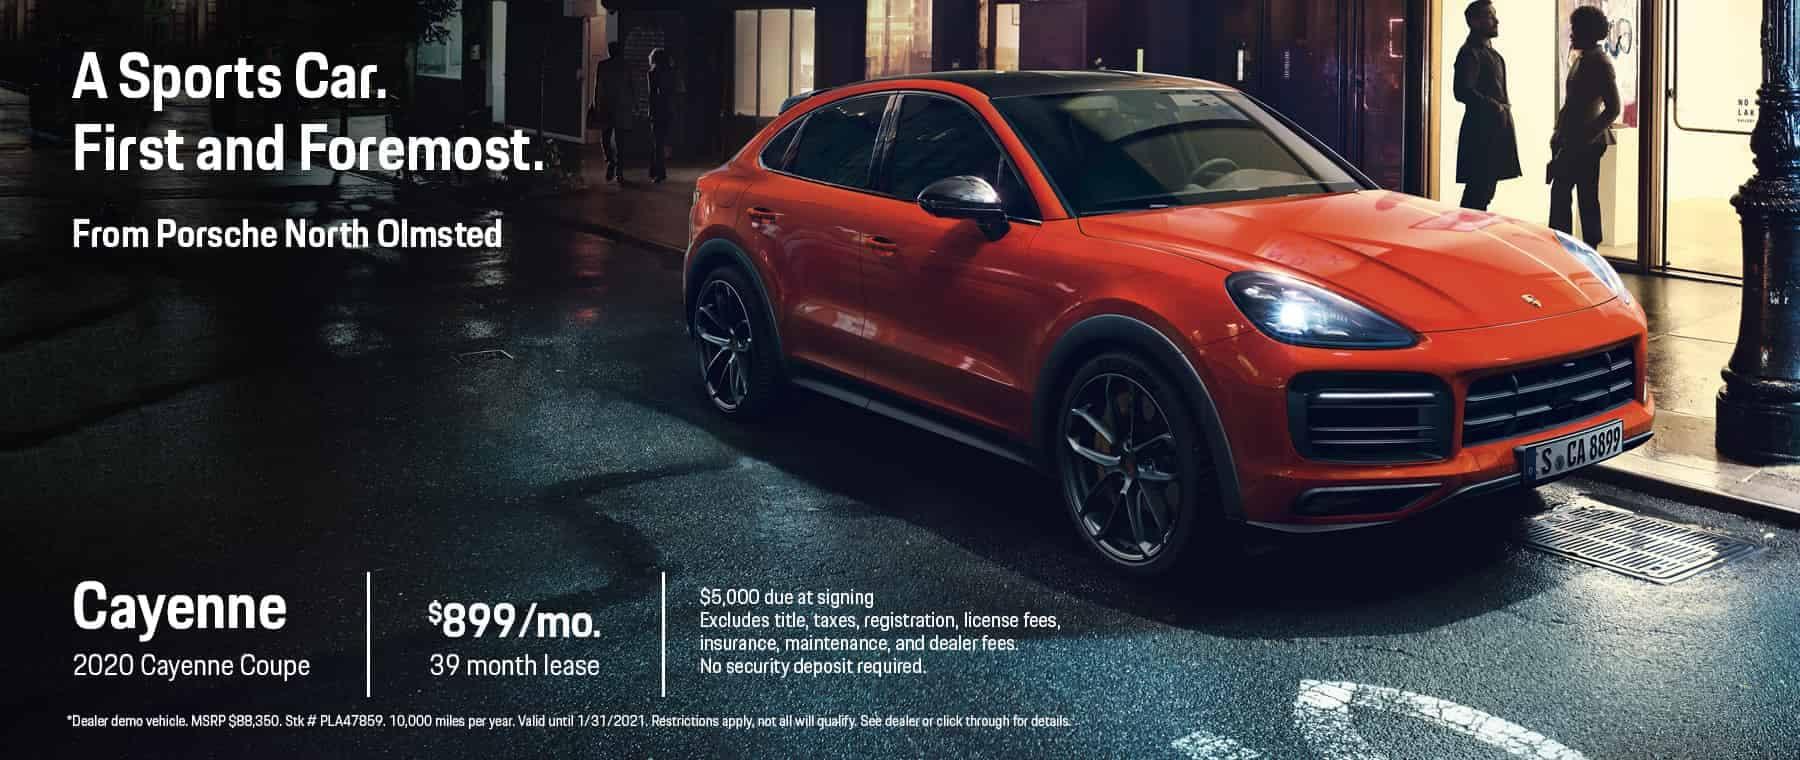 2020 Cayenne Coupe Lease $899/mo